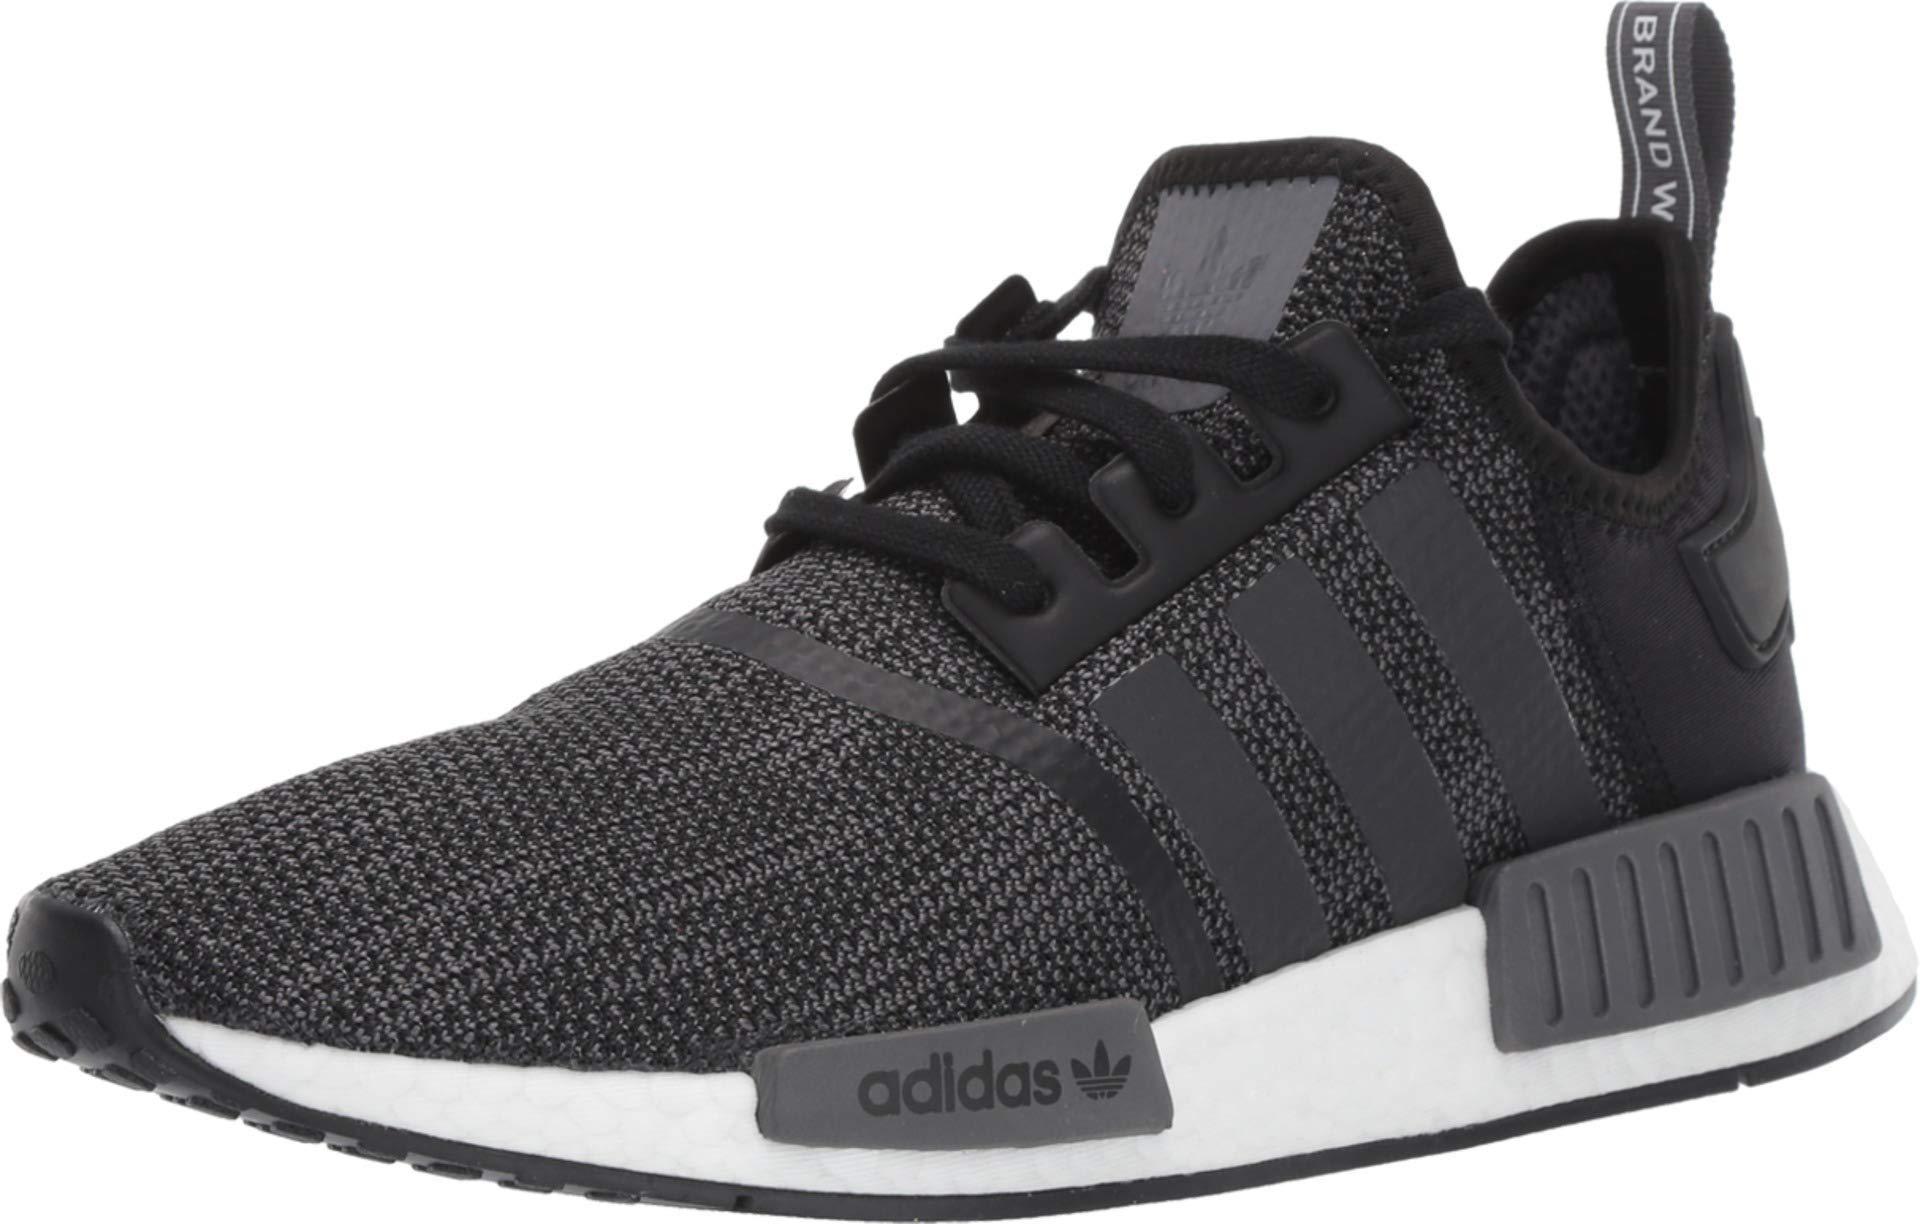 Adidas Originals Nmd R1 Shoe Men S Casual 11 Core Black Carbon